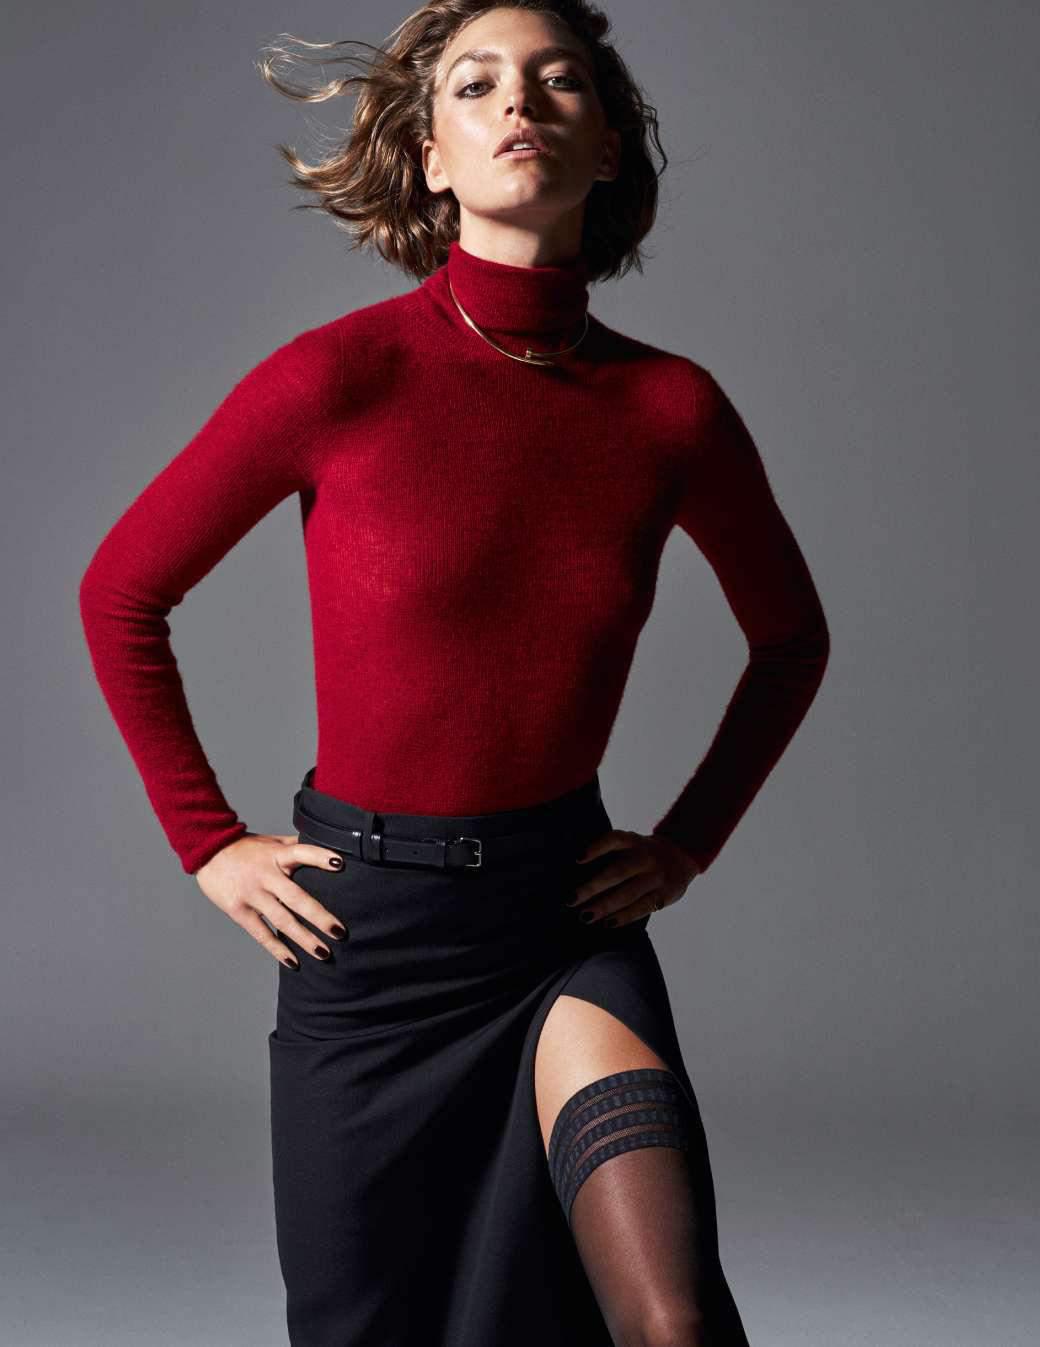 Elle France 8 Septembre 2017-Arizona Muse- (6).jpg